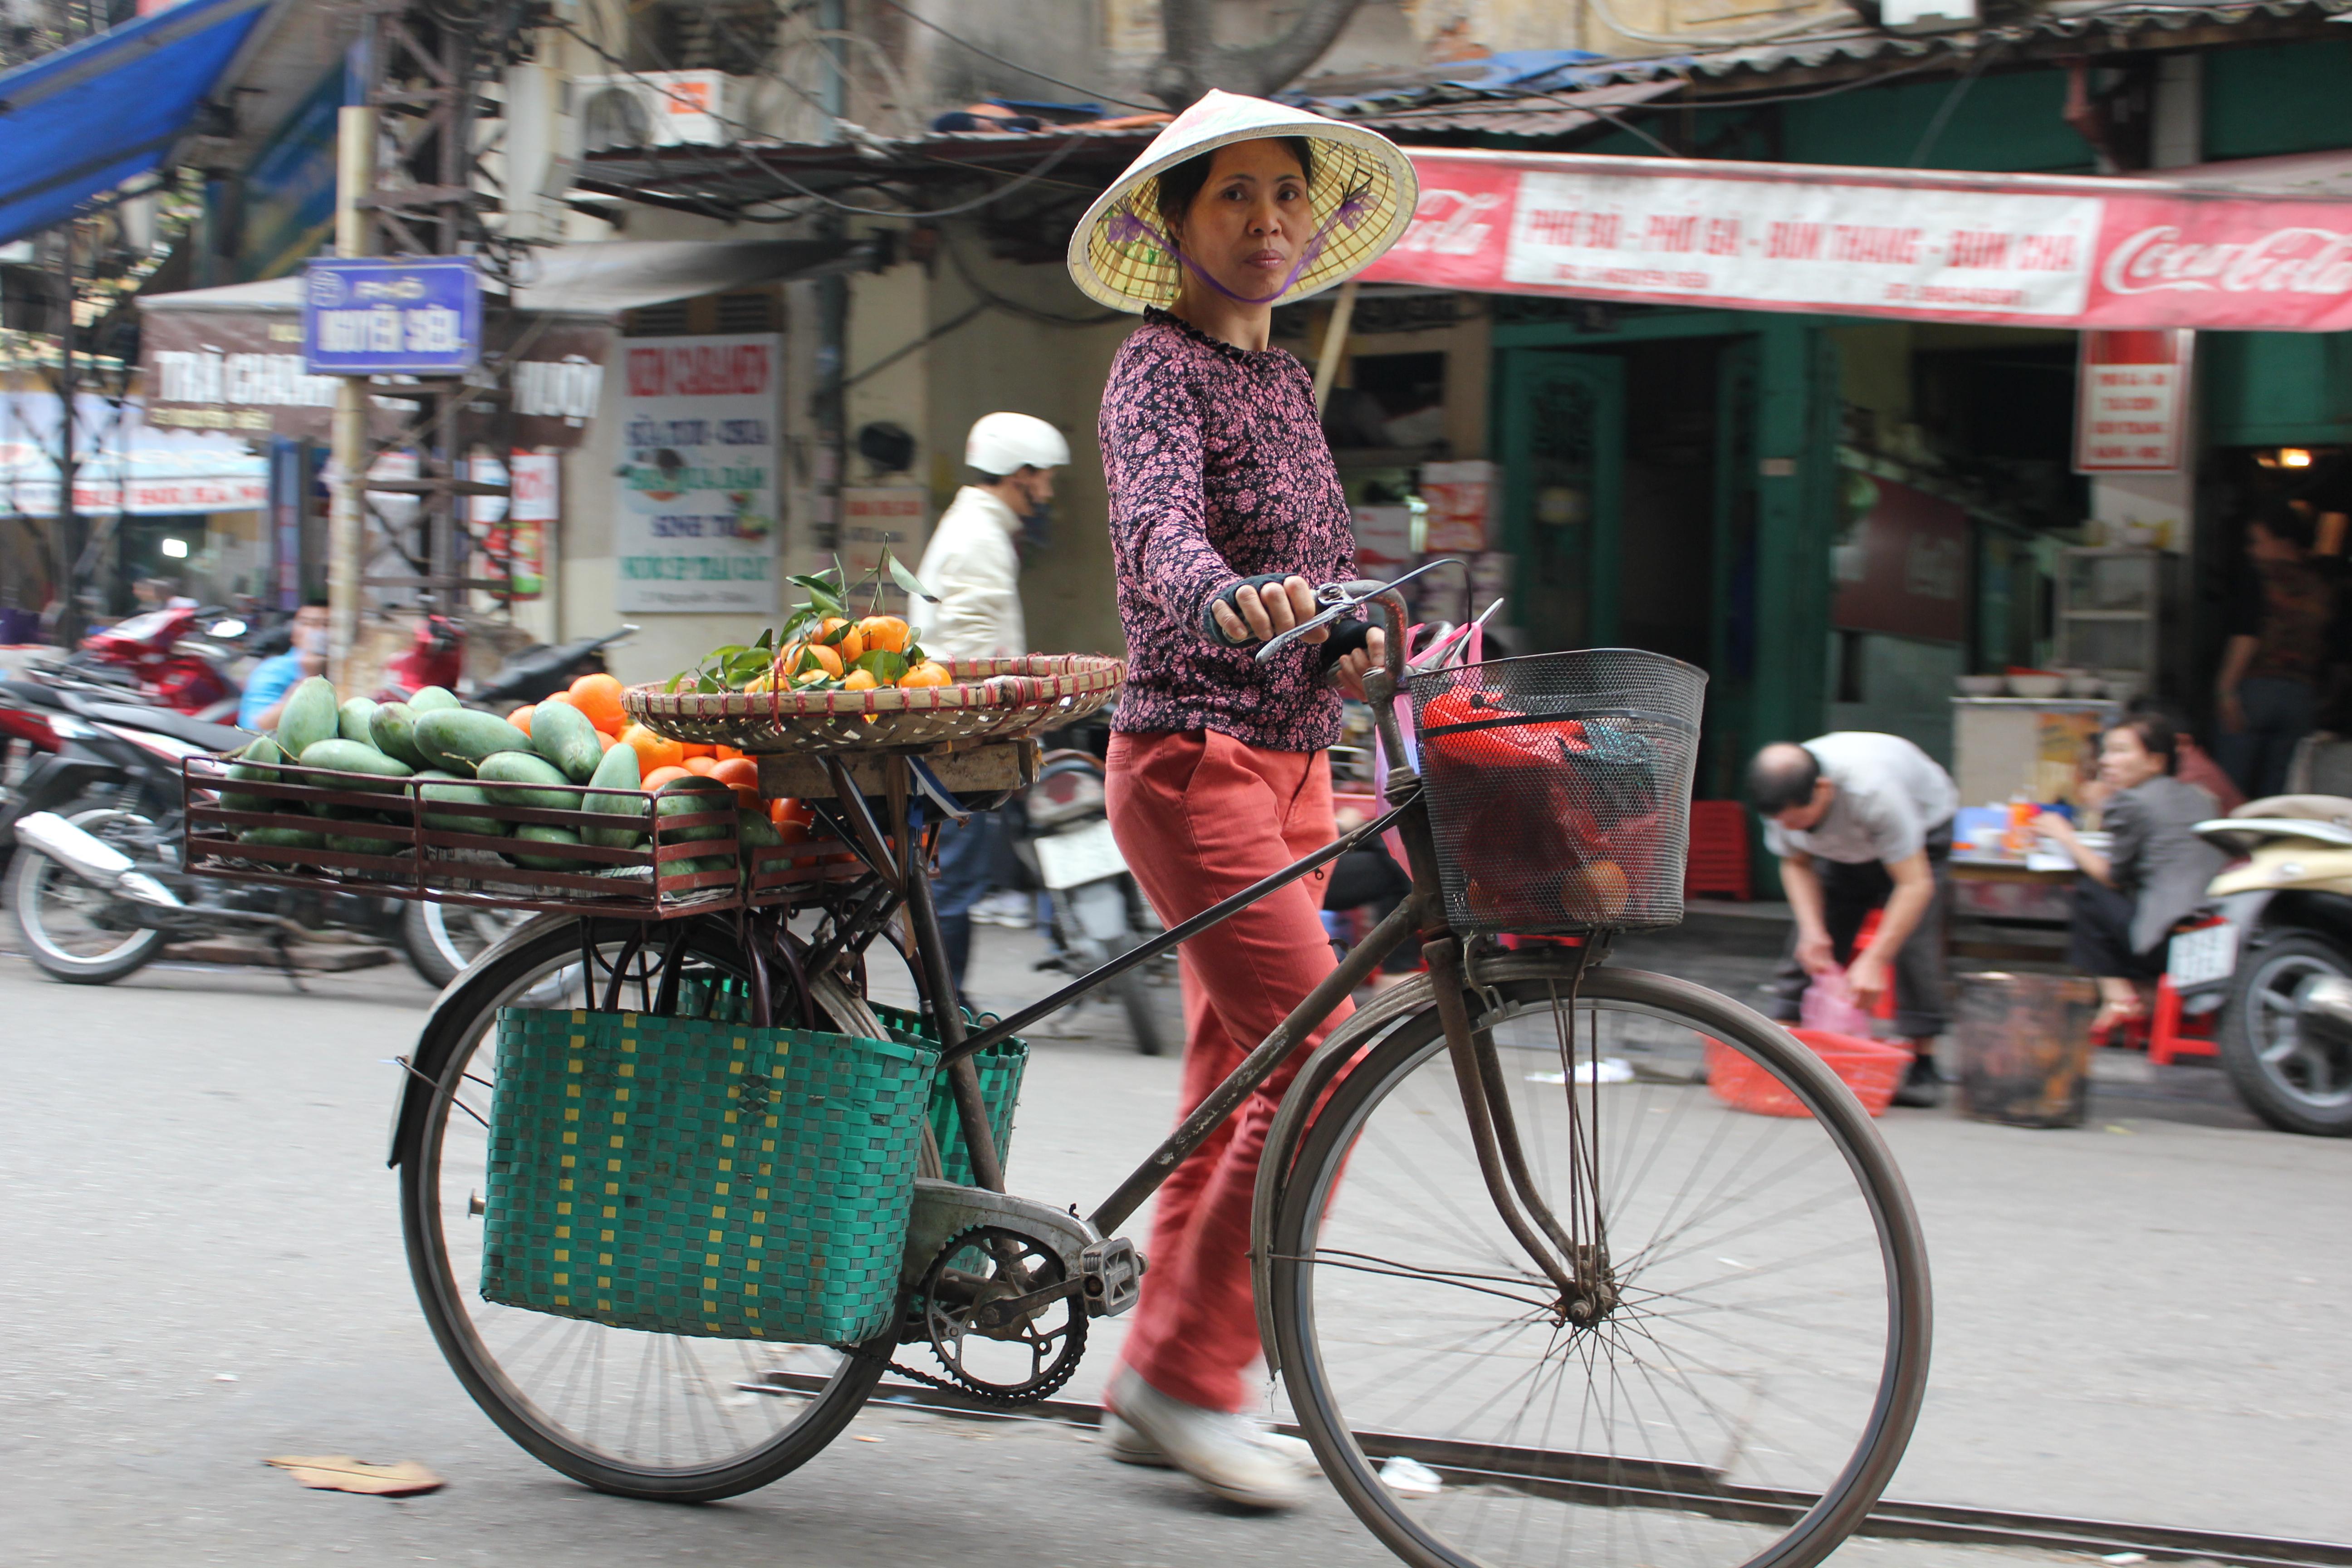 Good Morning Vietnam In Vietnamese : Good morning vietnam nathariane travel